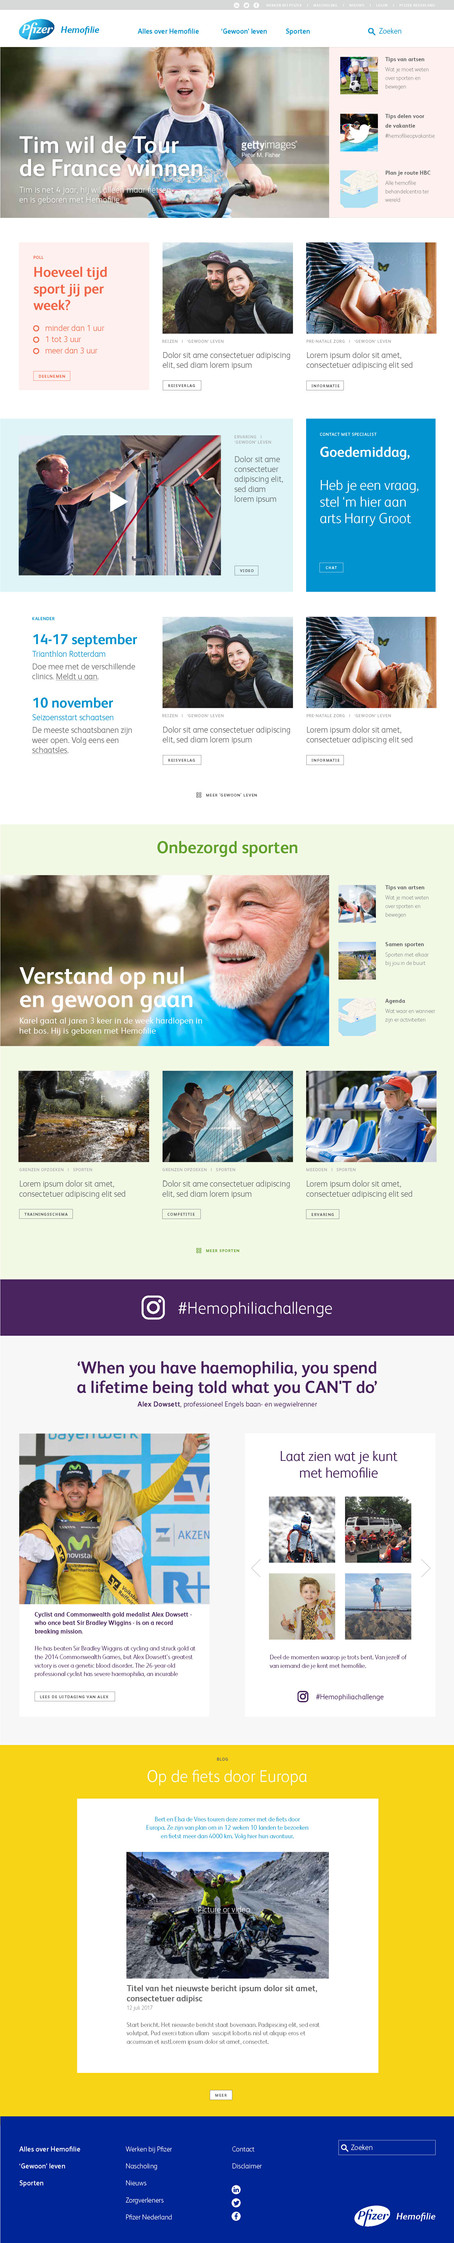 Ontwerp - hemofilie website